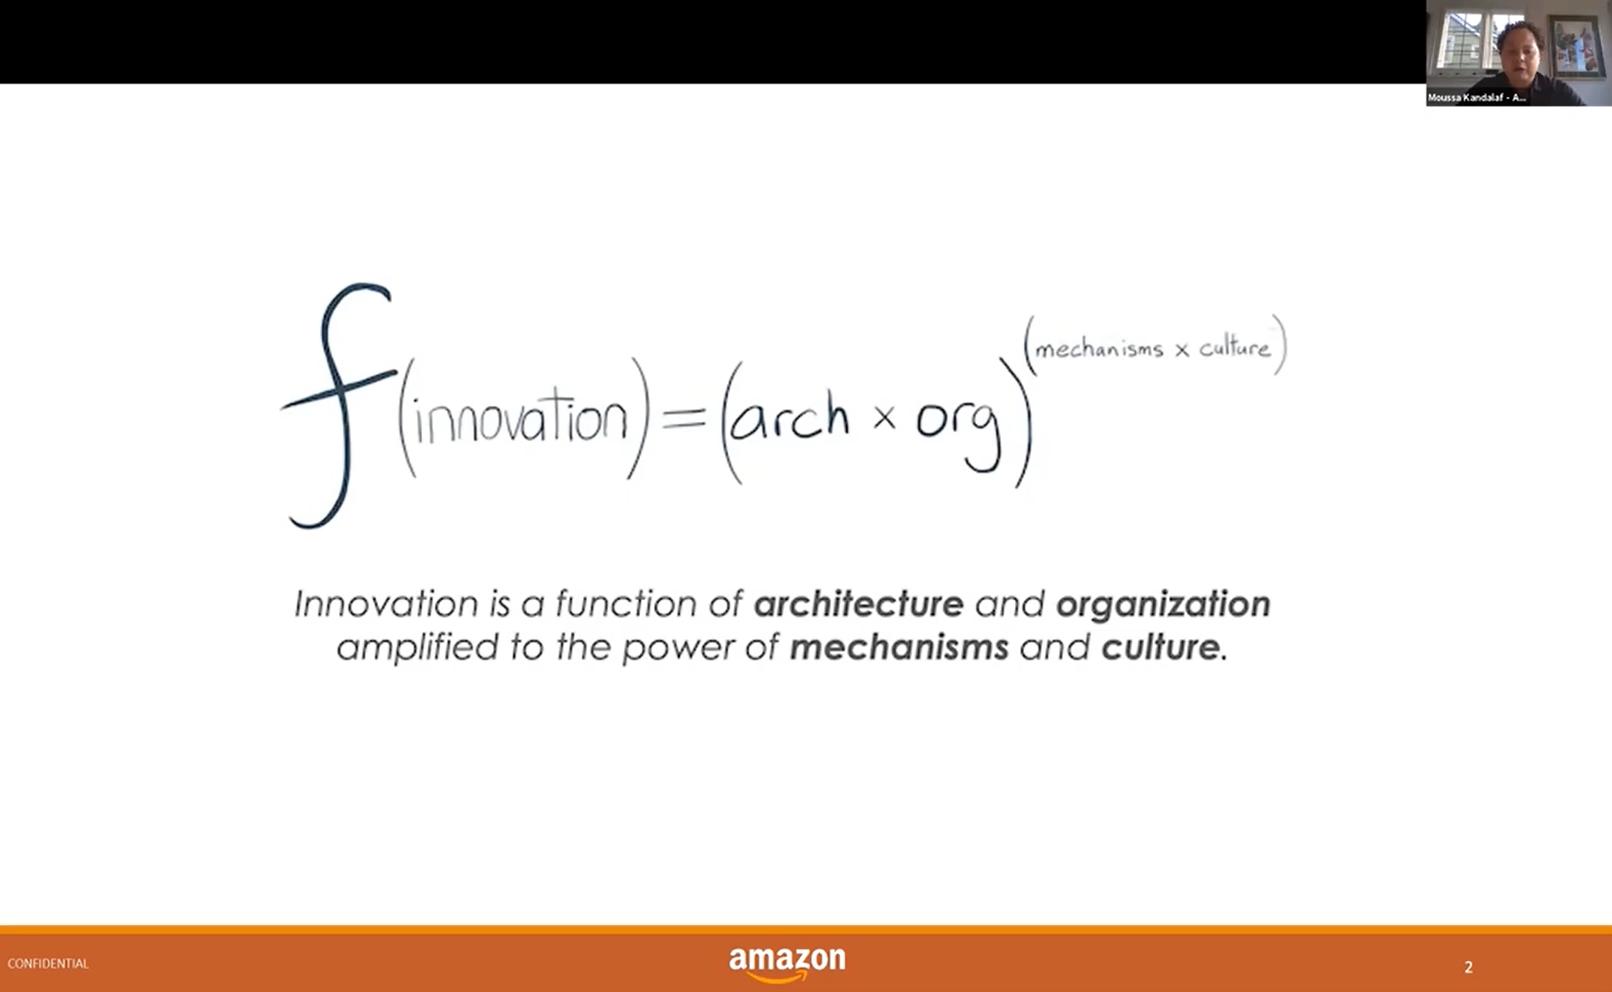 La fórmula de Amazon para innovar